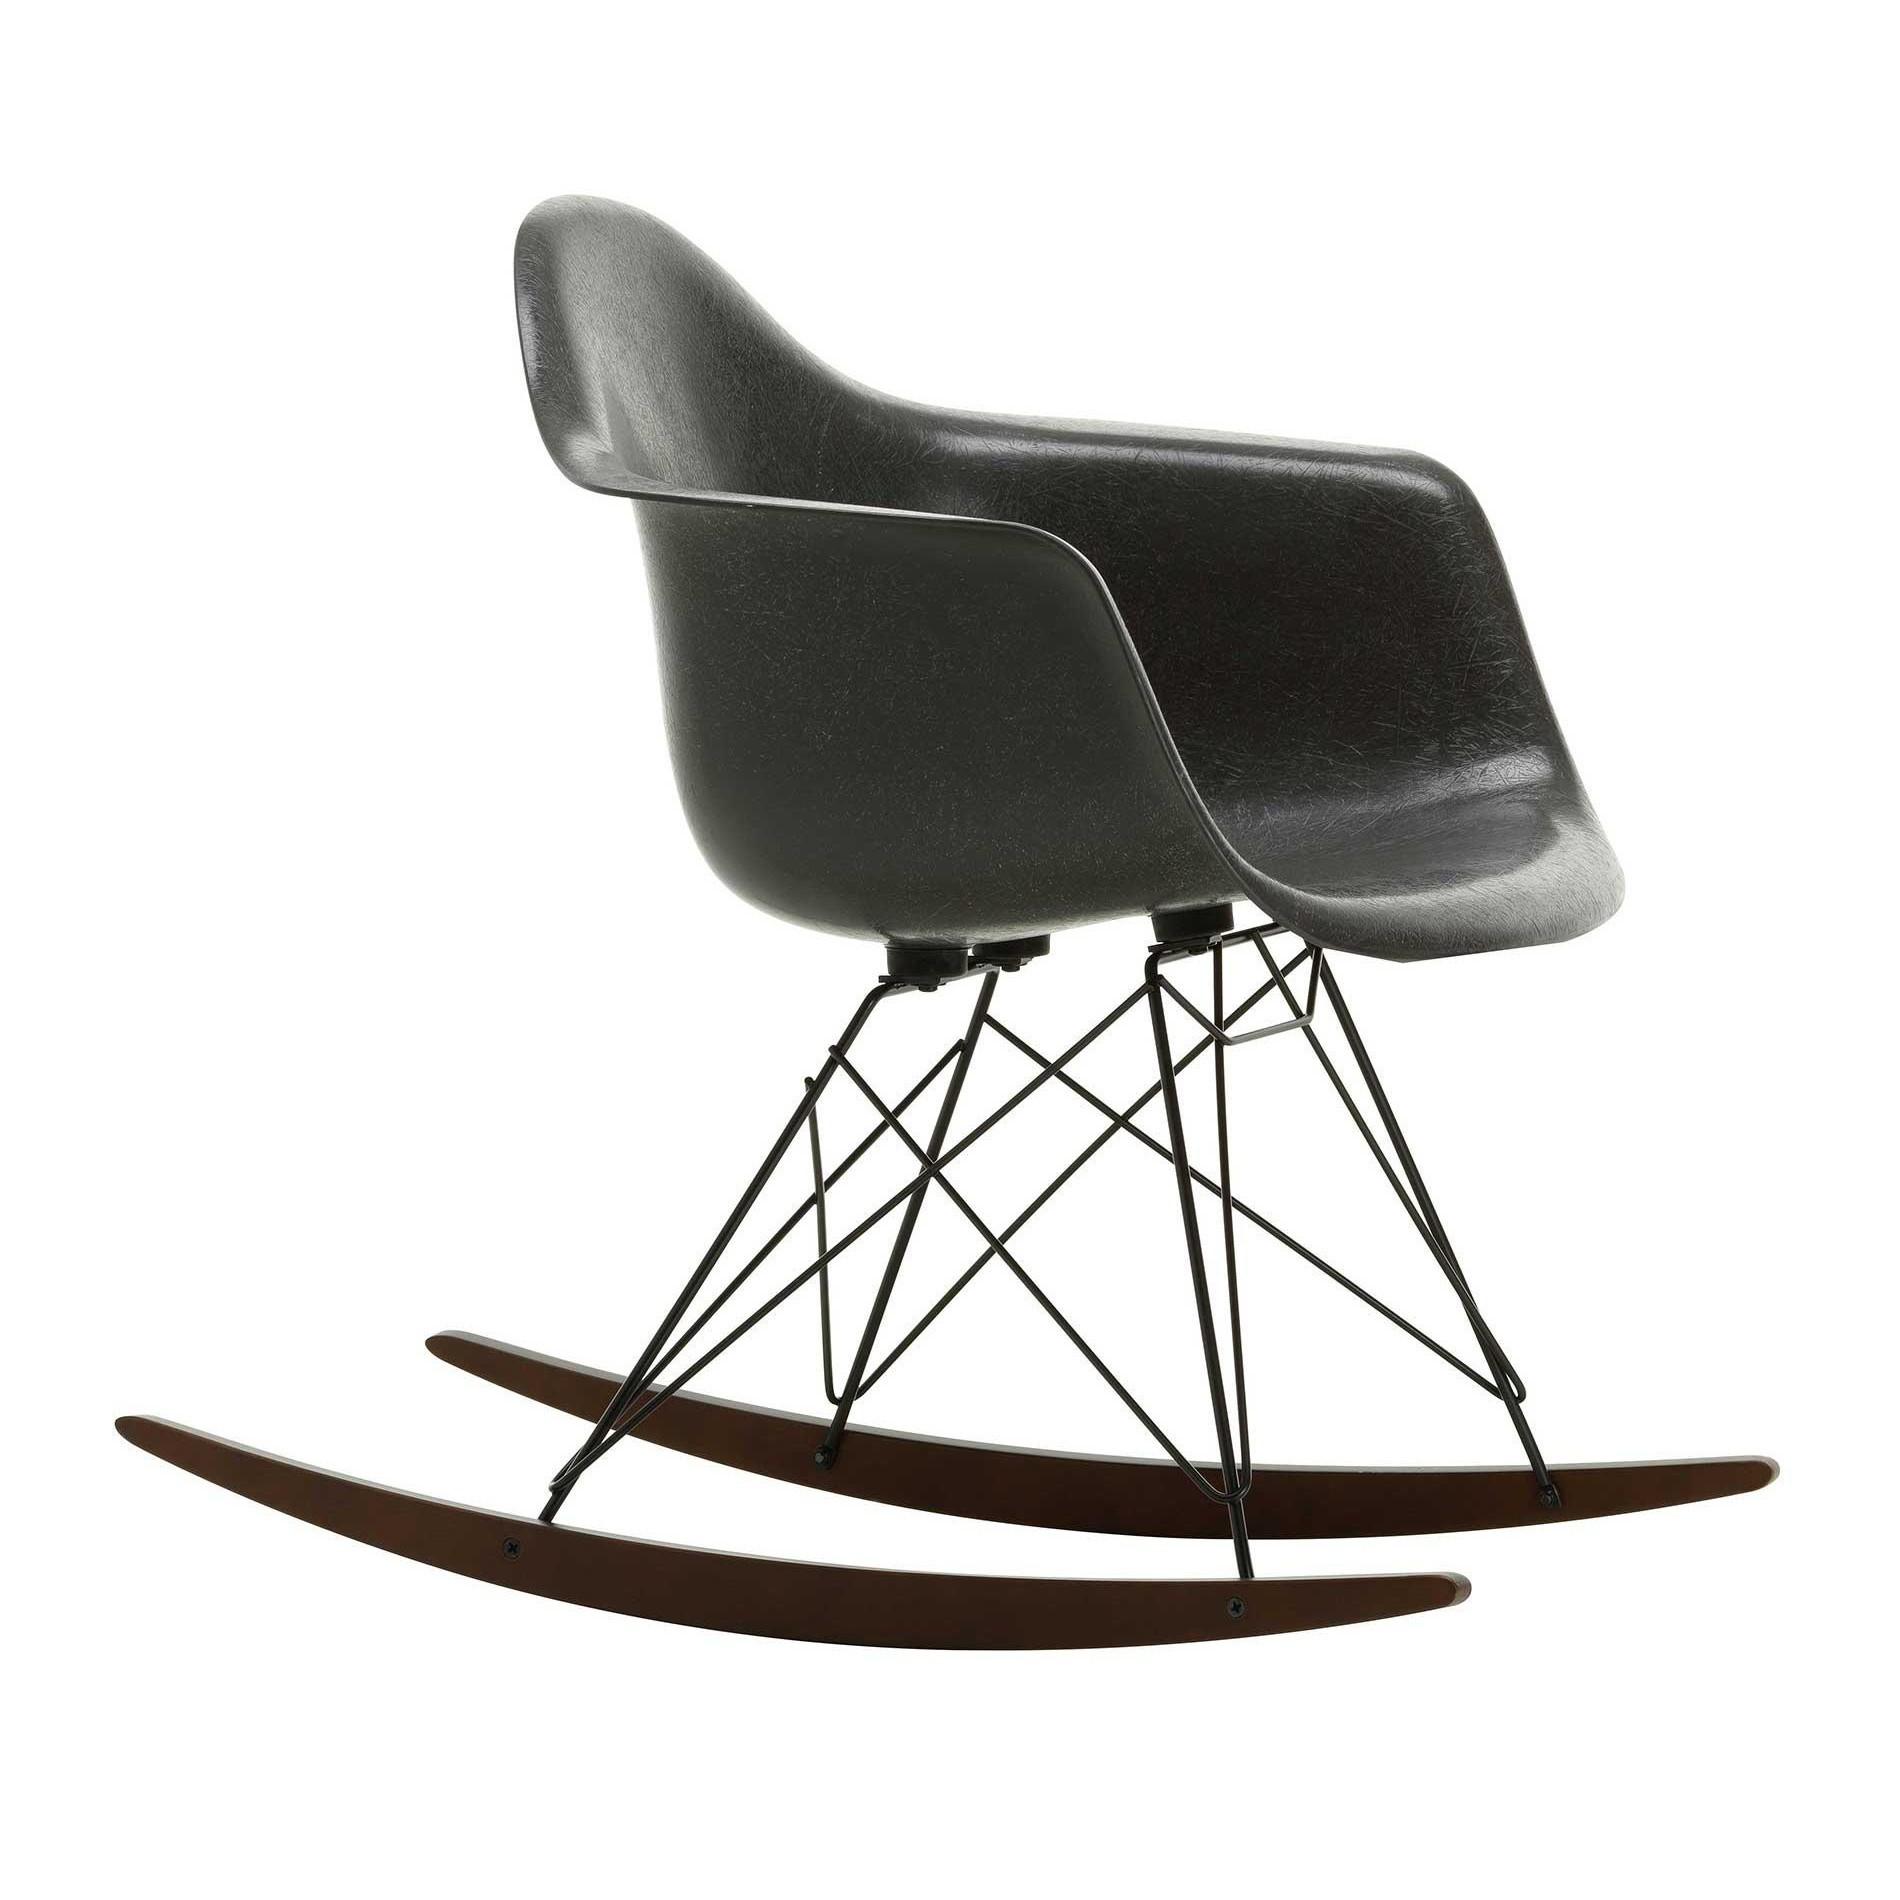 Picture of: Vitra Eames Fiberglass Armchair Rar Rocking Chair Black Base Ambientedirect